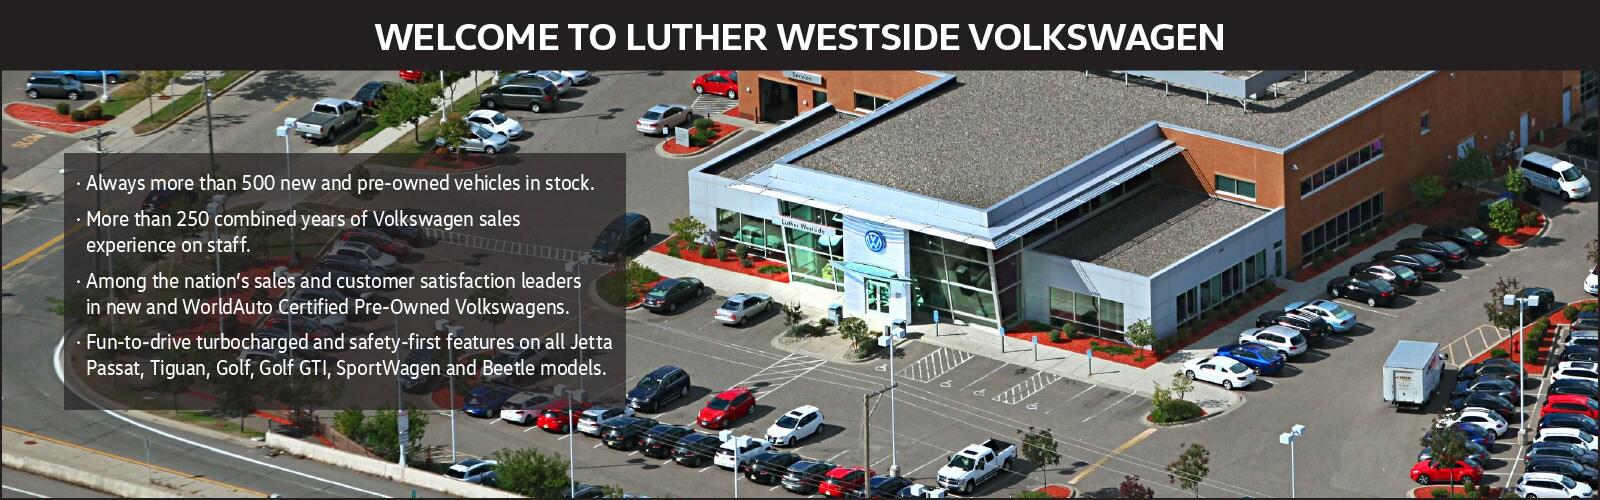 About Luther Westside Volkswagen A Volkswagen Dealership In Saint Louis Park